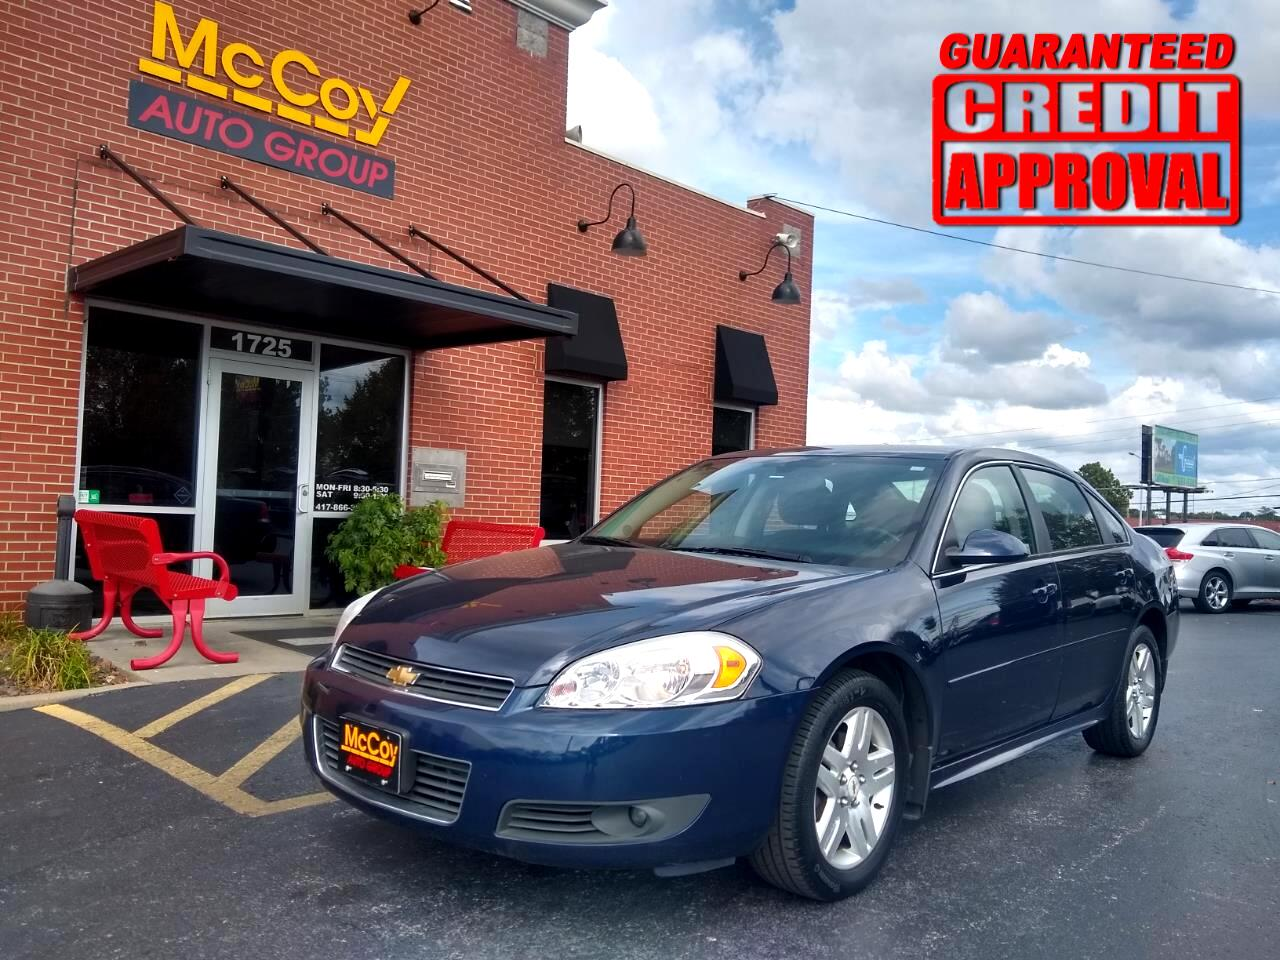 Chevrolet Impala 4dr Sdn LT Retail 2011